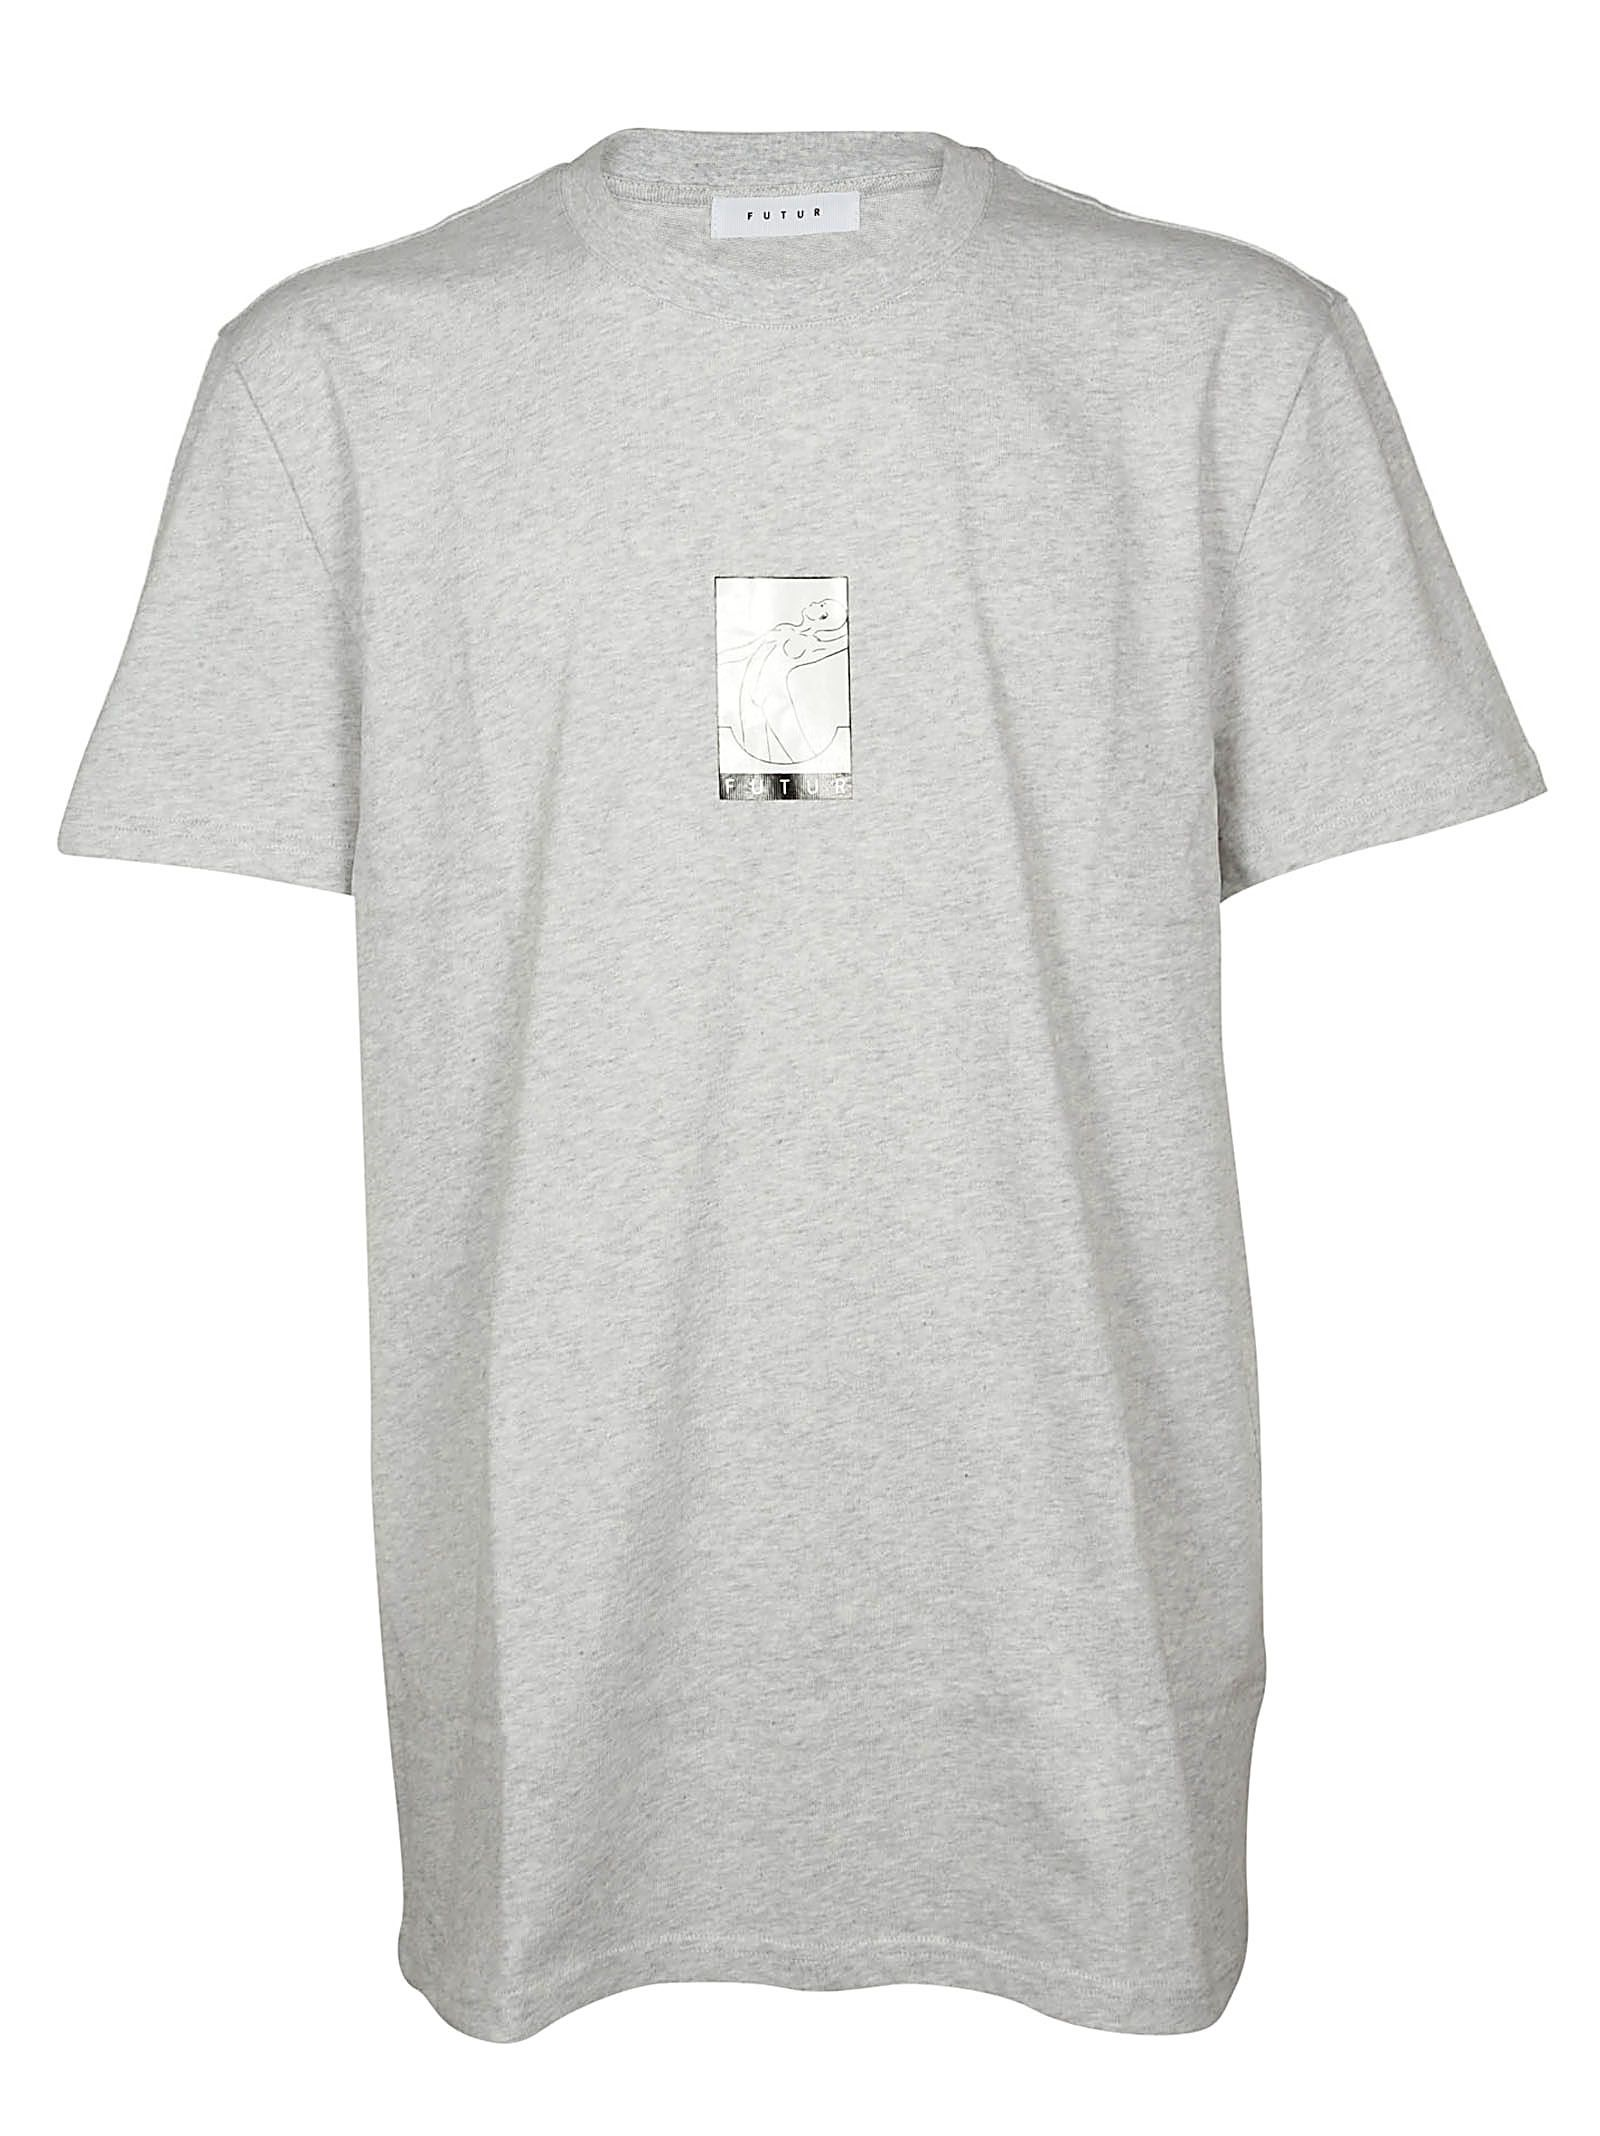 Free Shipping Wiki TOPWEAR - T-shirts Traffic People Outlet Big Sale Websites Sale Nicekicks PR0Vdoz